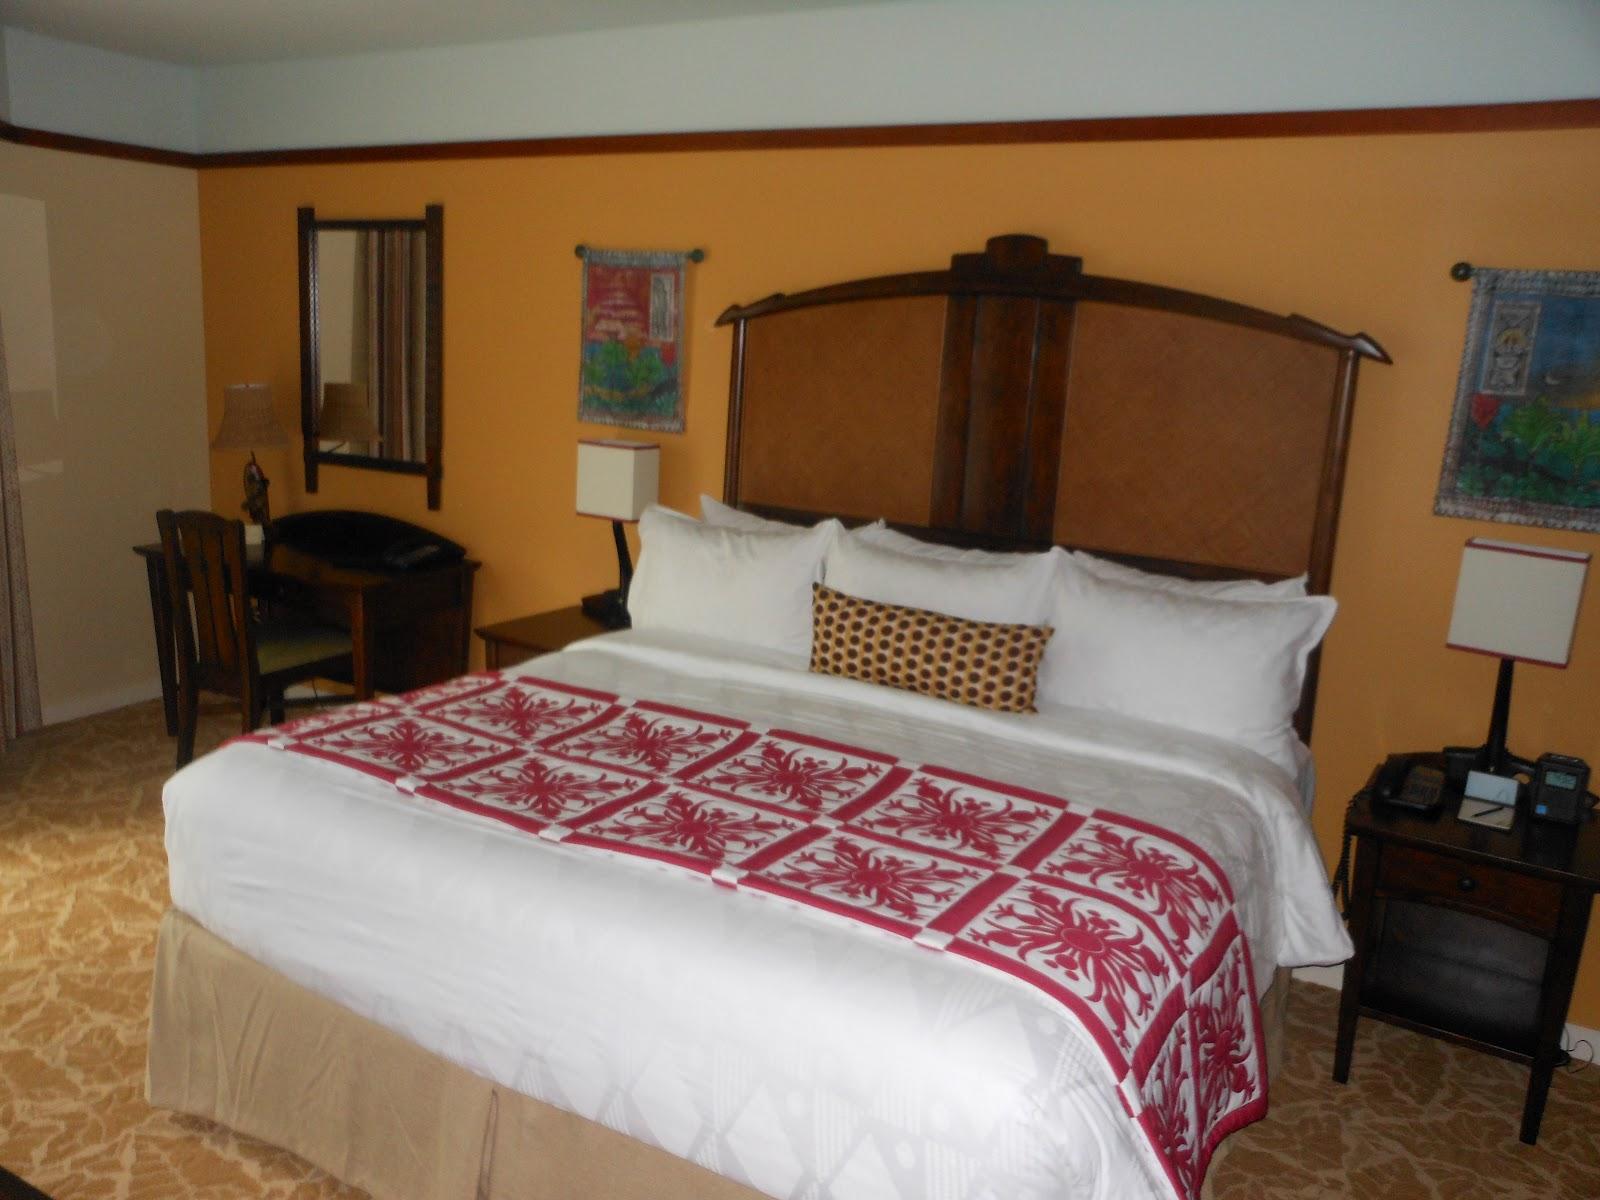 One bedroom Villa in Paradise- Aulani - Tips from the Disney Divas ...